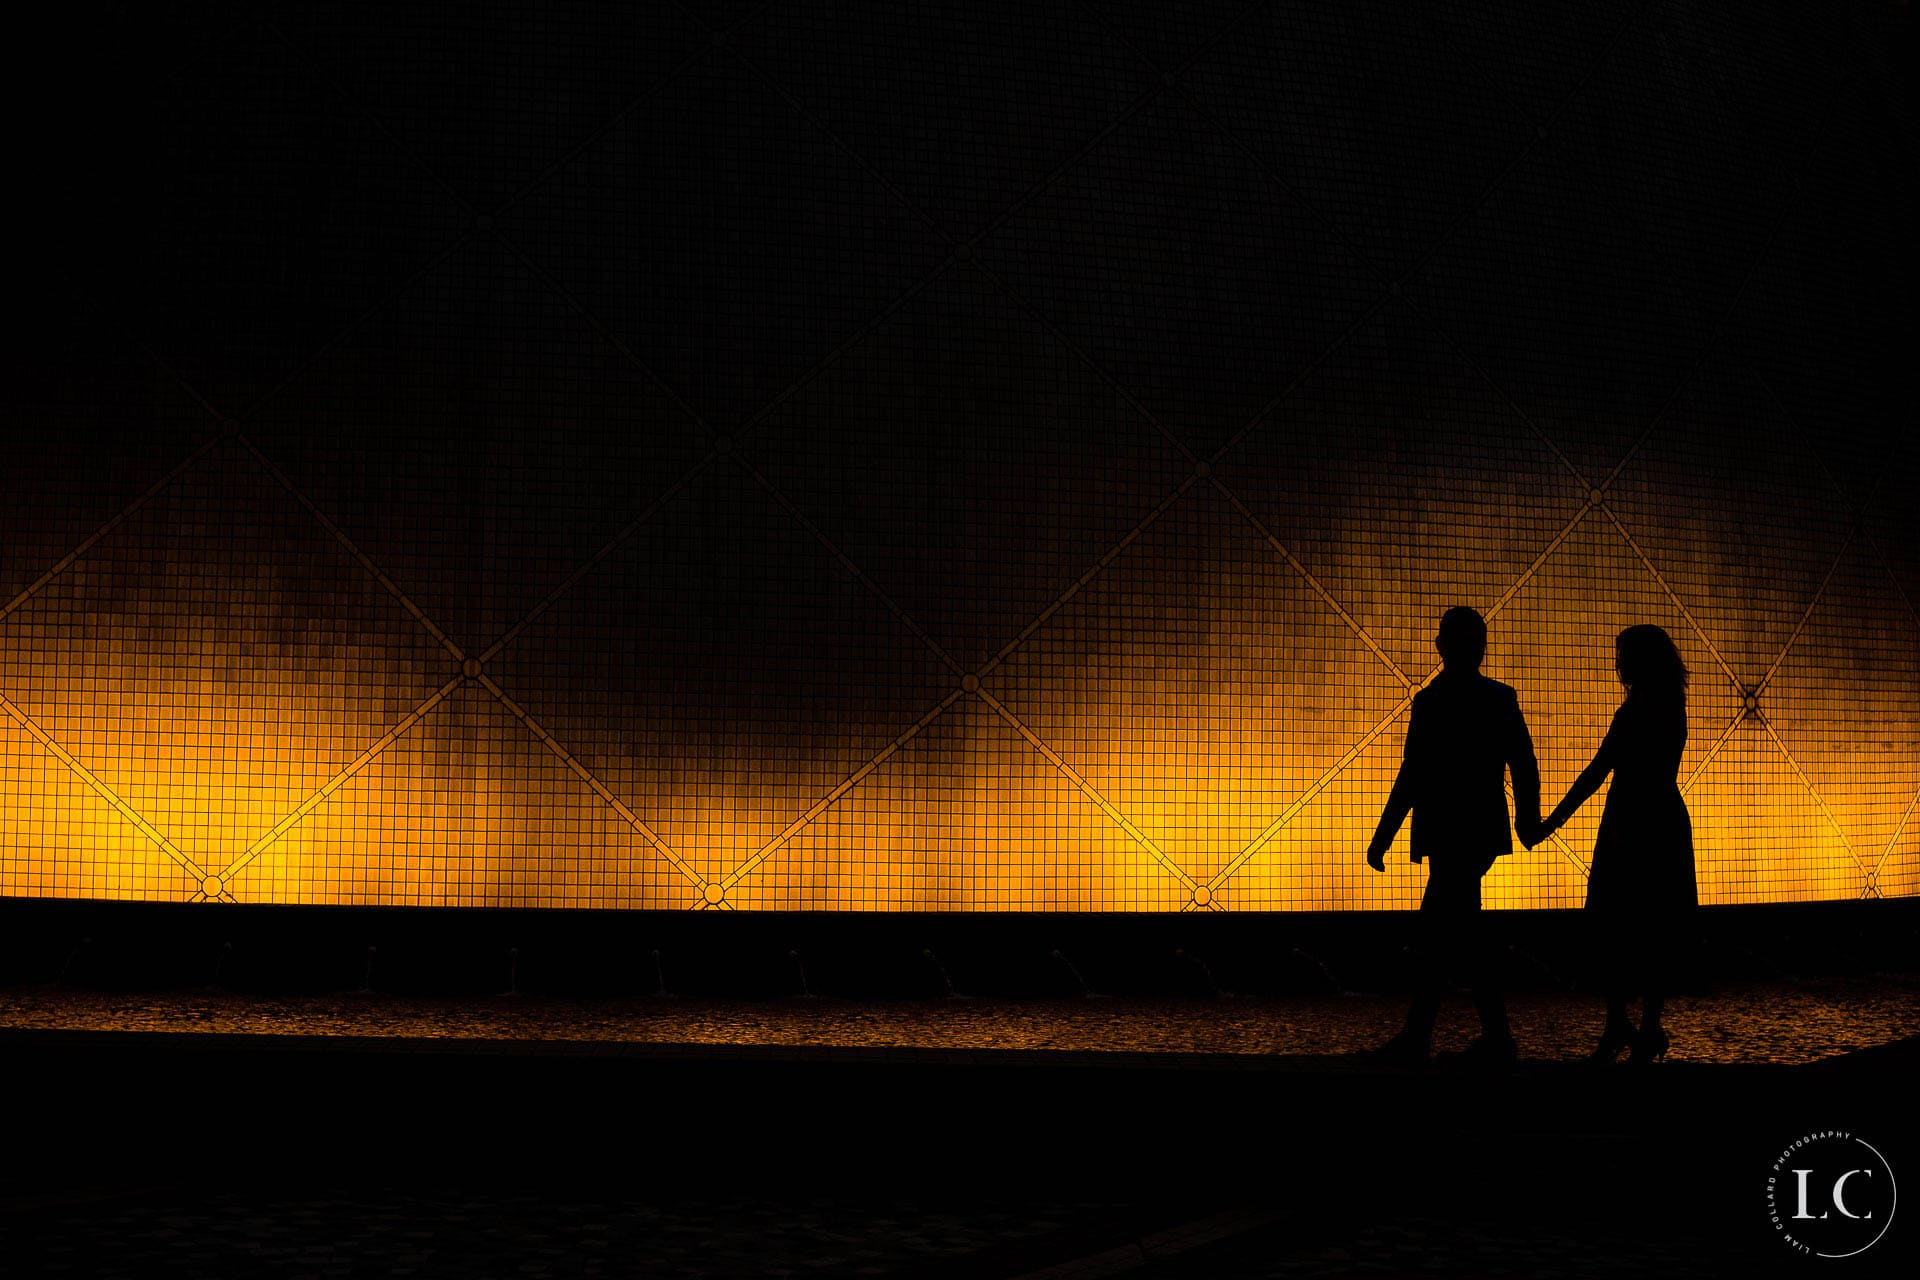 Bride and Groom shadows at night